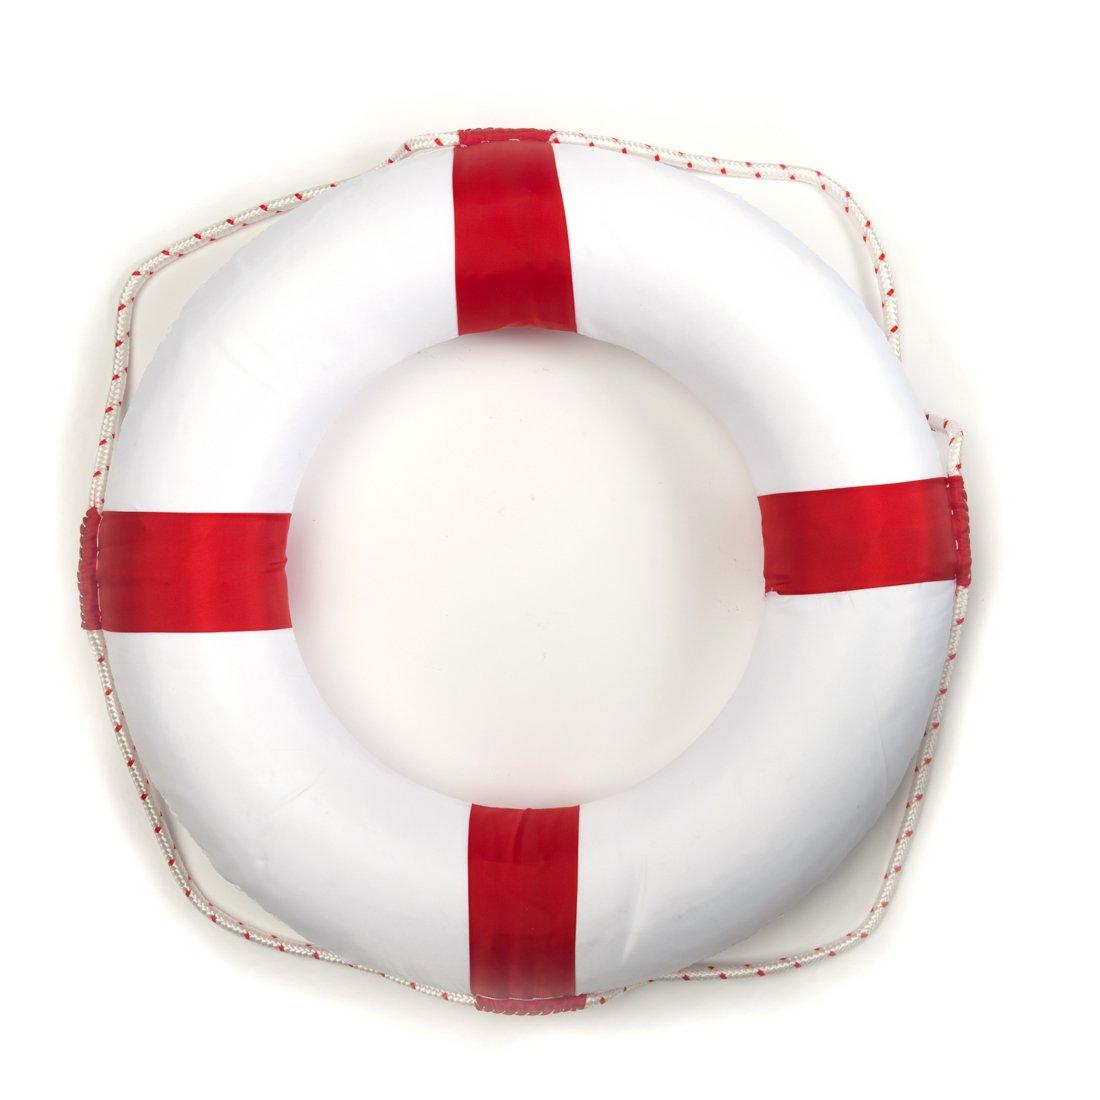 motawator 50cm Diameter Swim Foam Ring Buoy Swimming Pool Safety Life Preserver W/Nylon Cover Kid Child Adult by motawator